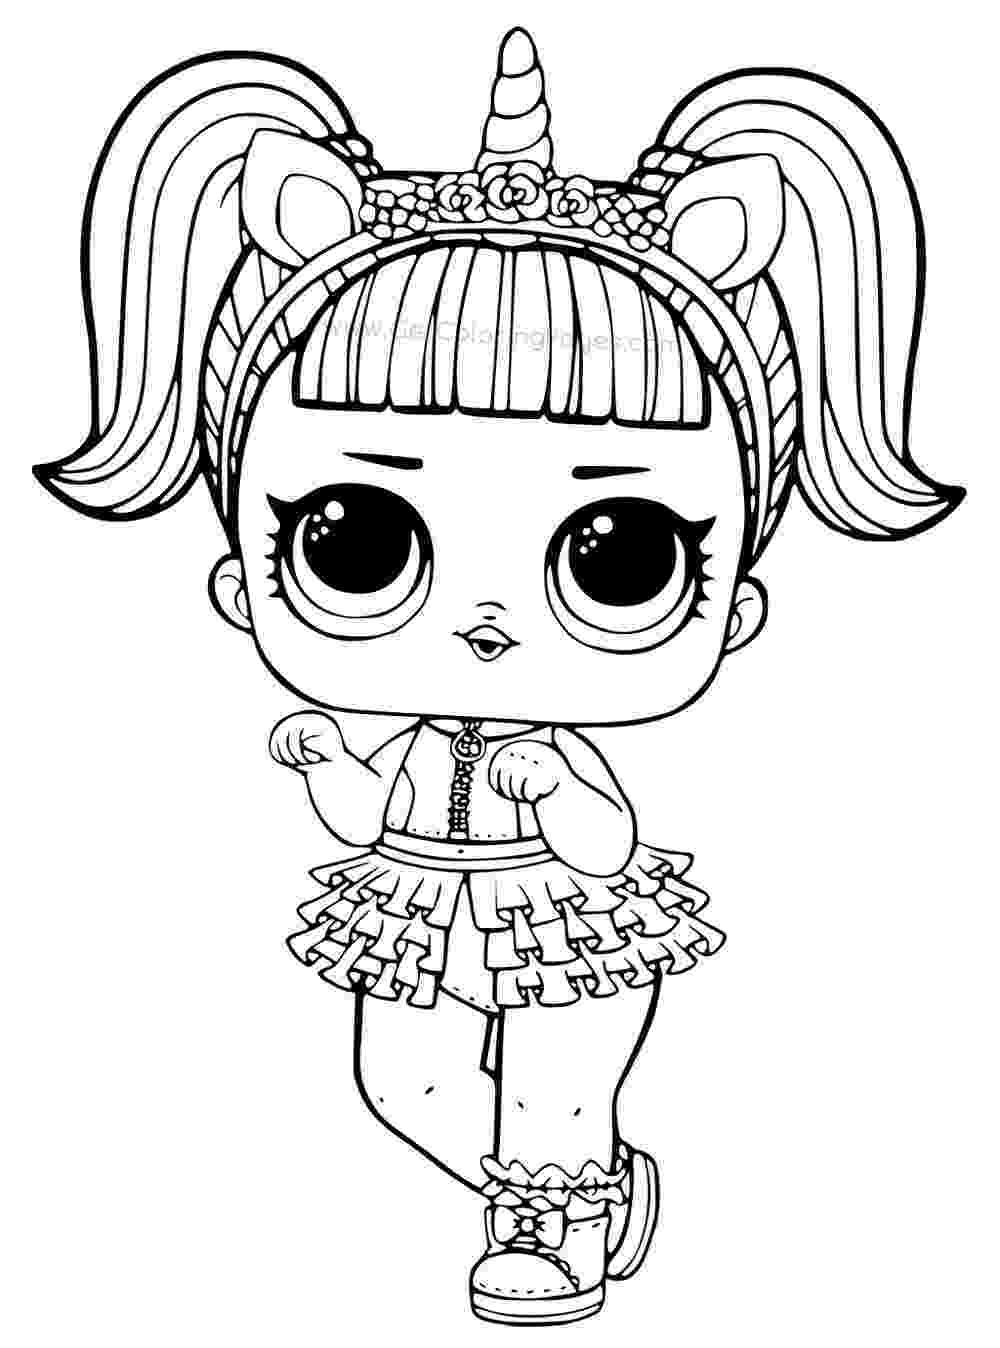 dolls coloring pages lol surprise dolls coloring pages print them for free dolls coloring pages